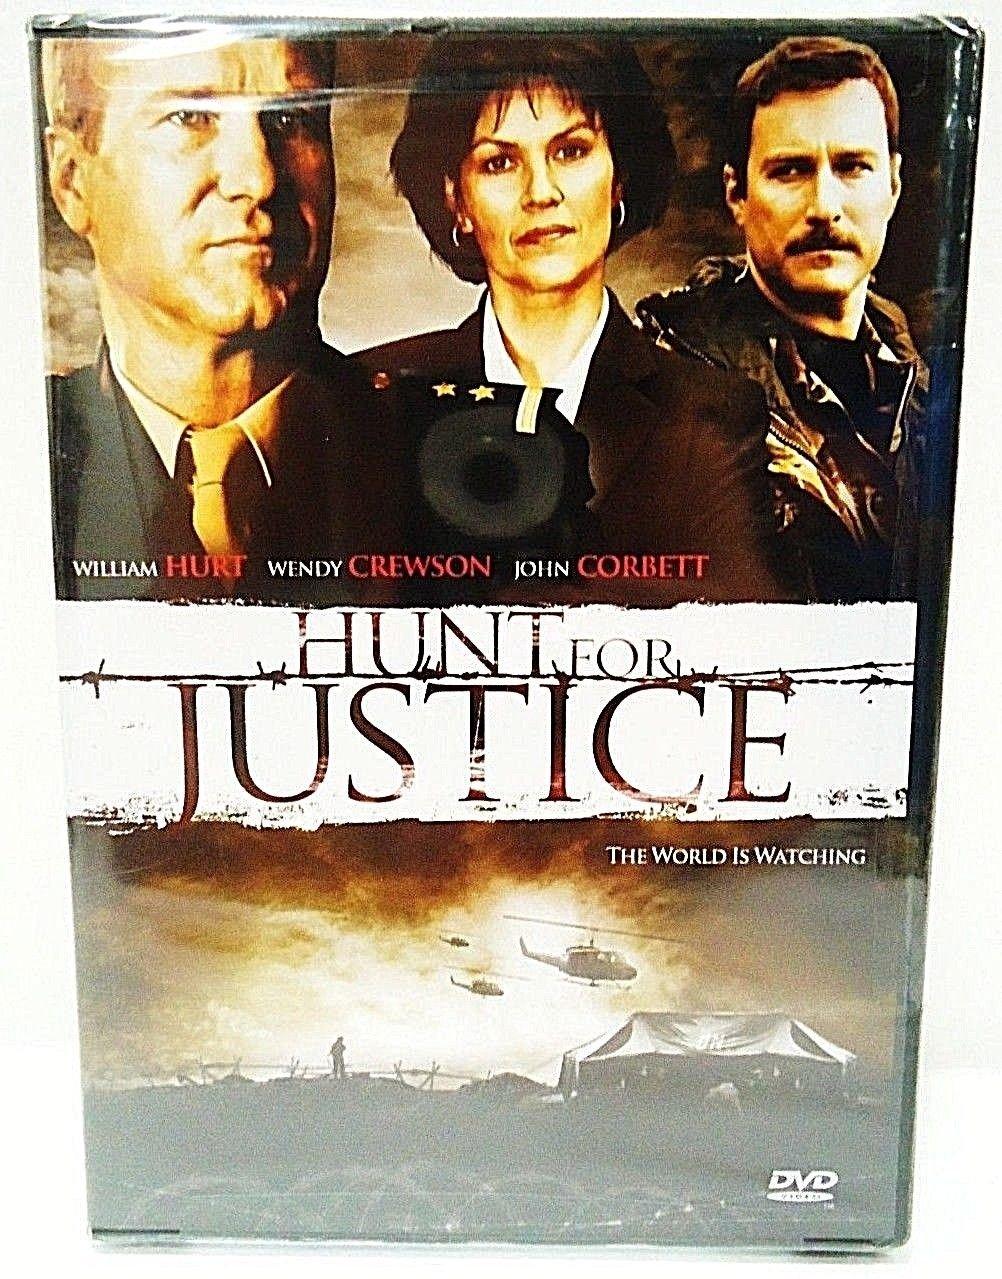 HUNT FOR JUSTICE - DVD - WILLIAM HURT - NEW - SEALED - YUGOSLAVIA - WAR - MOVIE